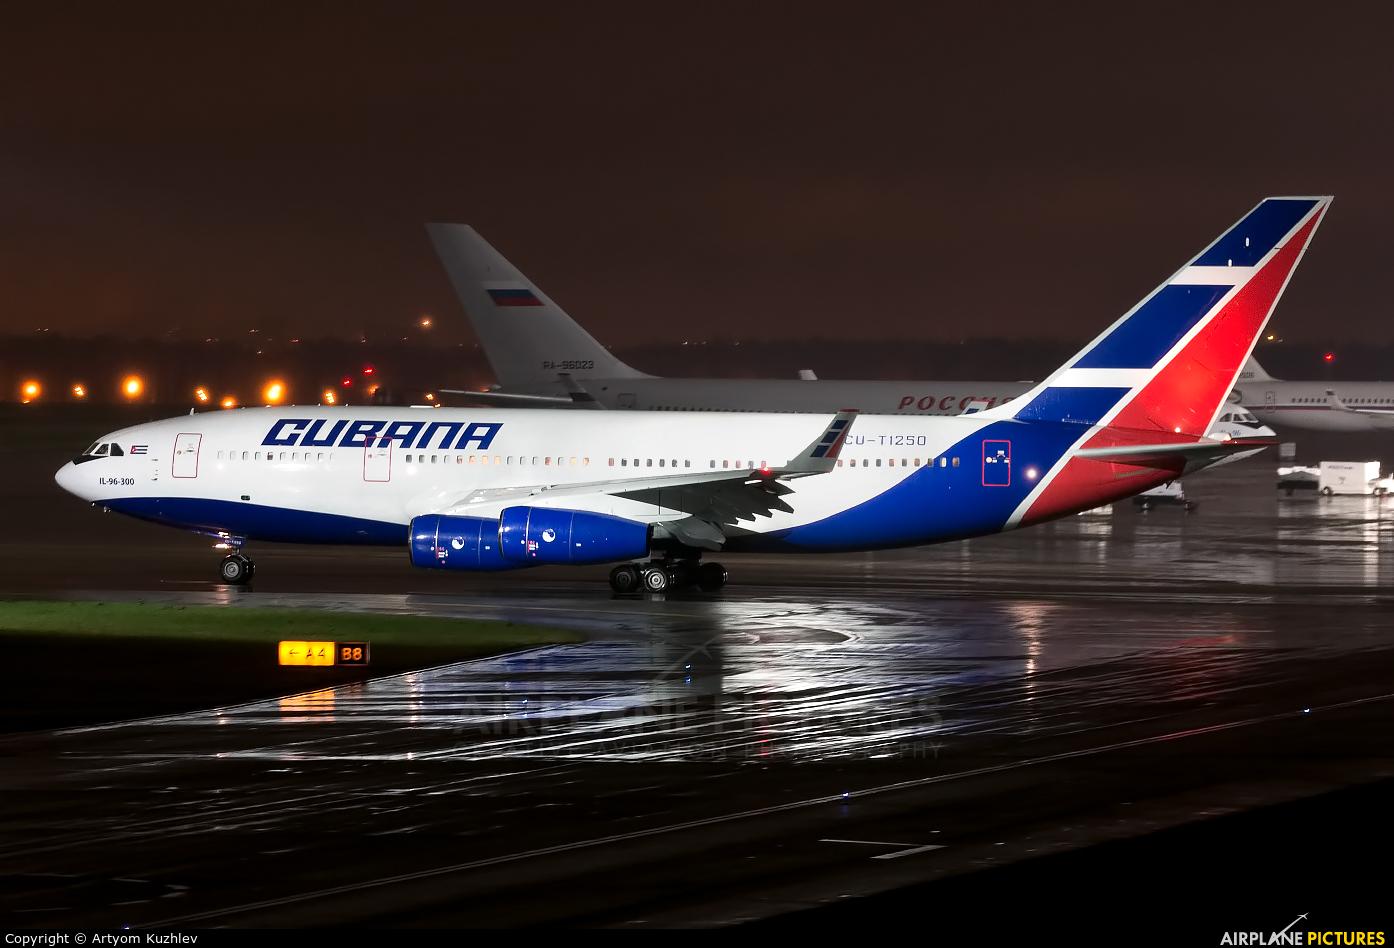 Cubana CU-T1250 aircraft at Moscow - Vnukovo